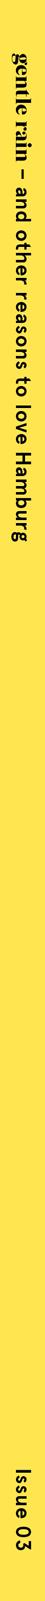 spritebaker logo